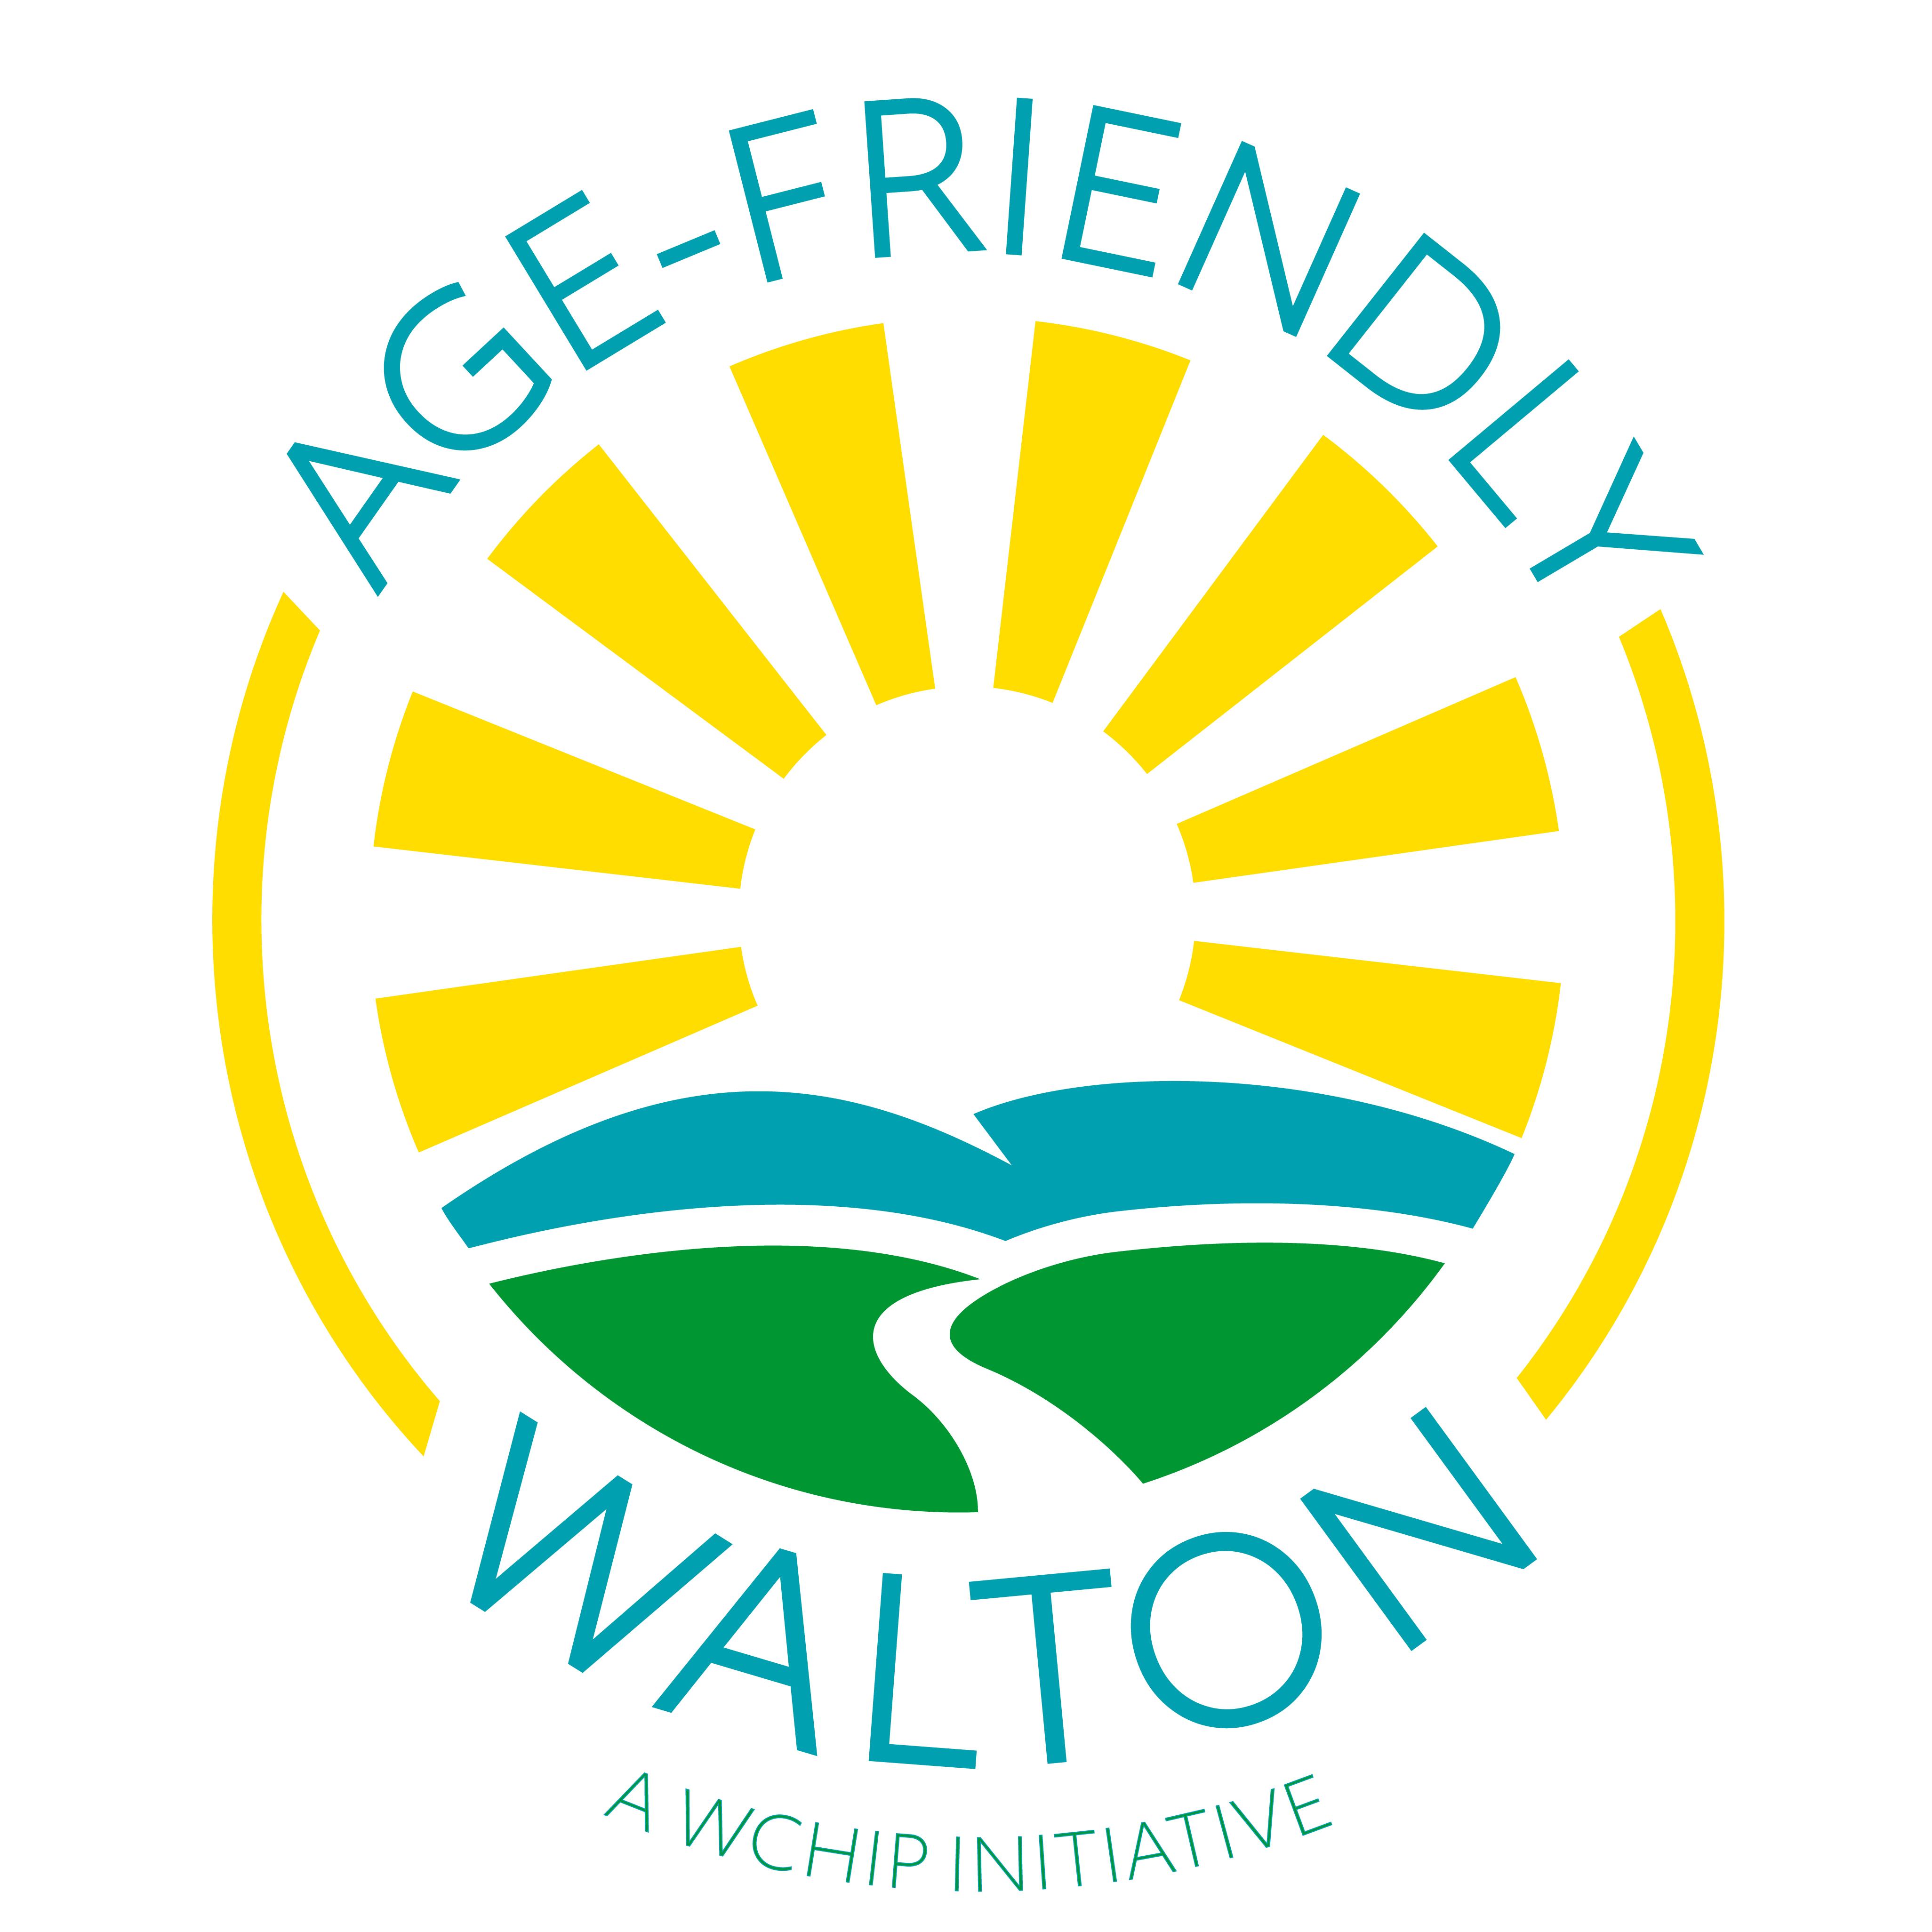 Age-Friendly-Walton-Logo.jpg